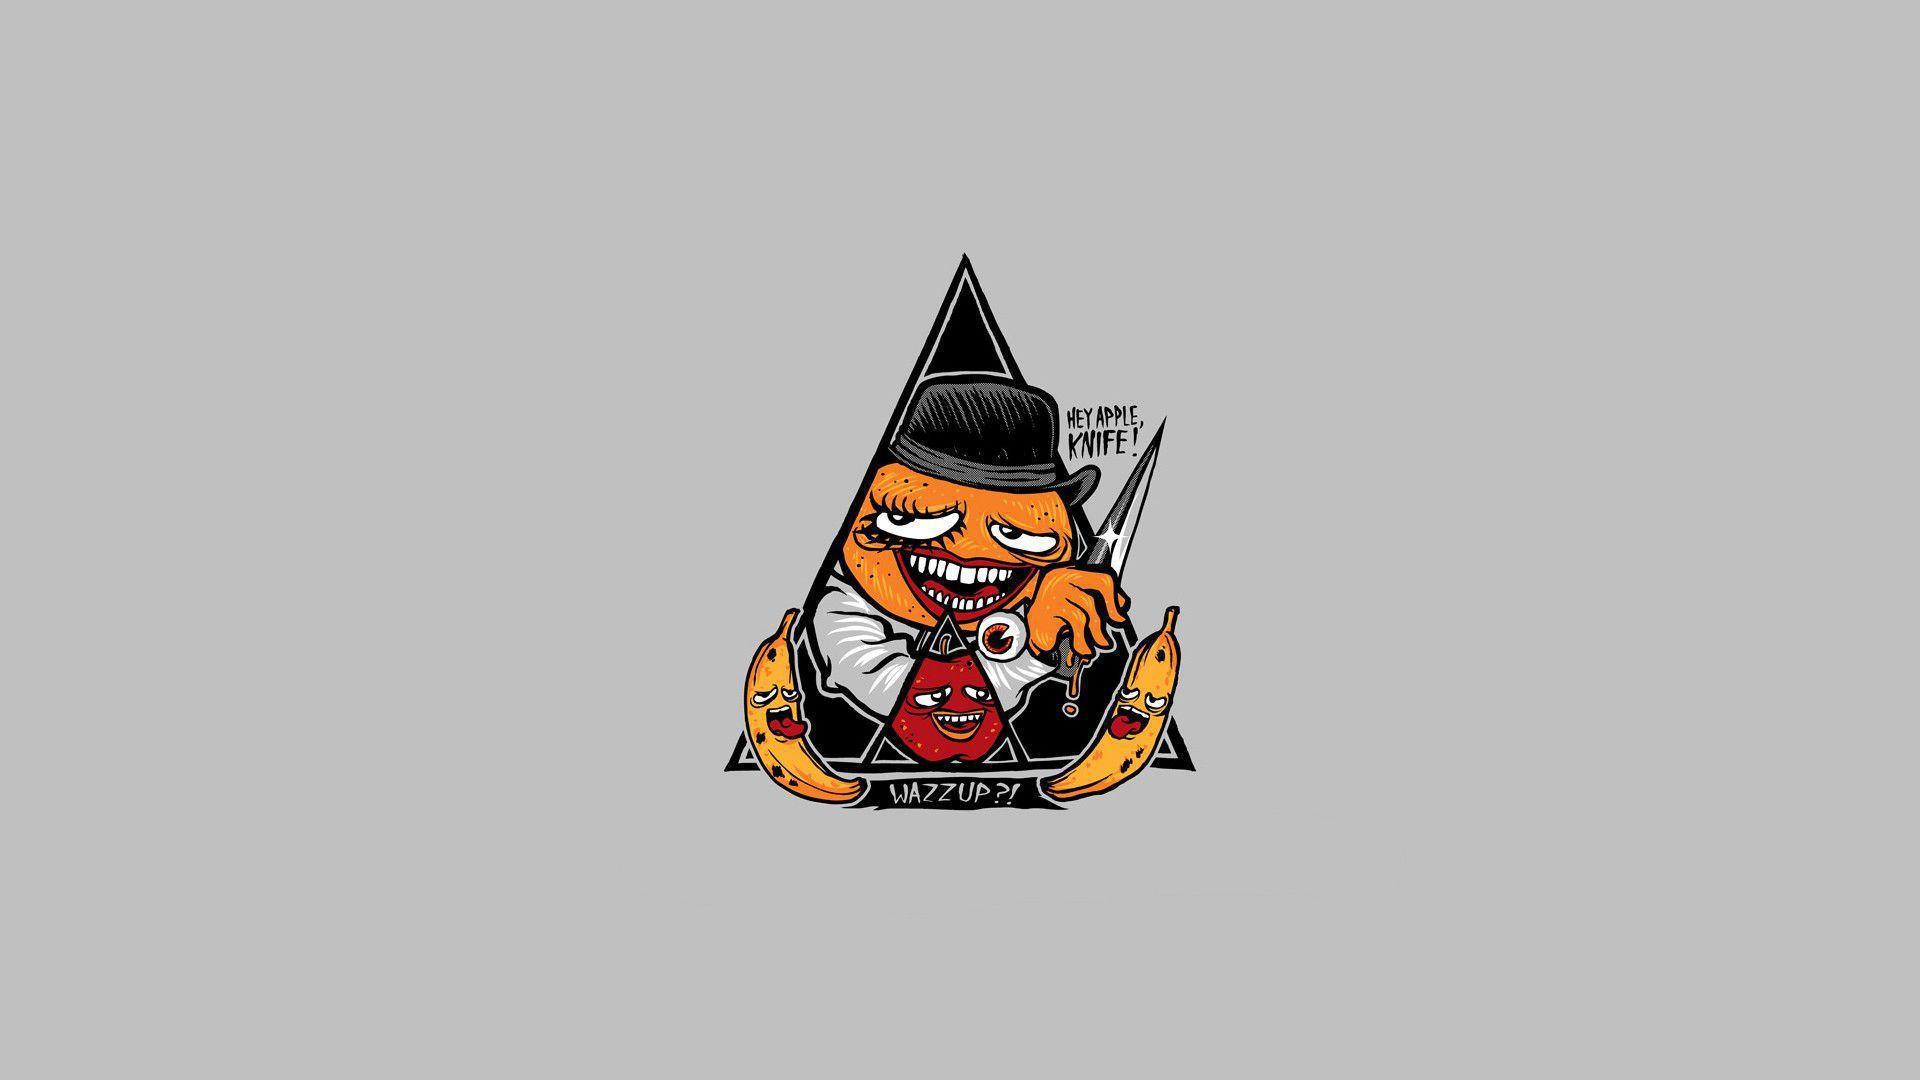 A Clockwork Orange Pictures